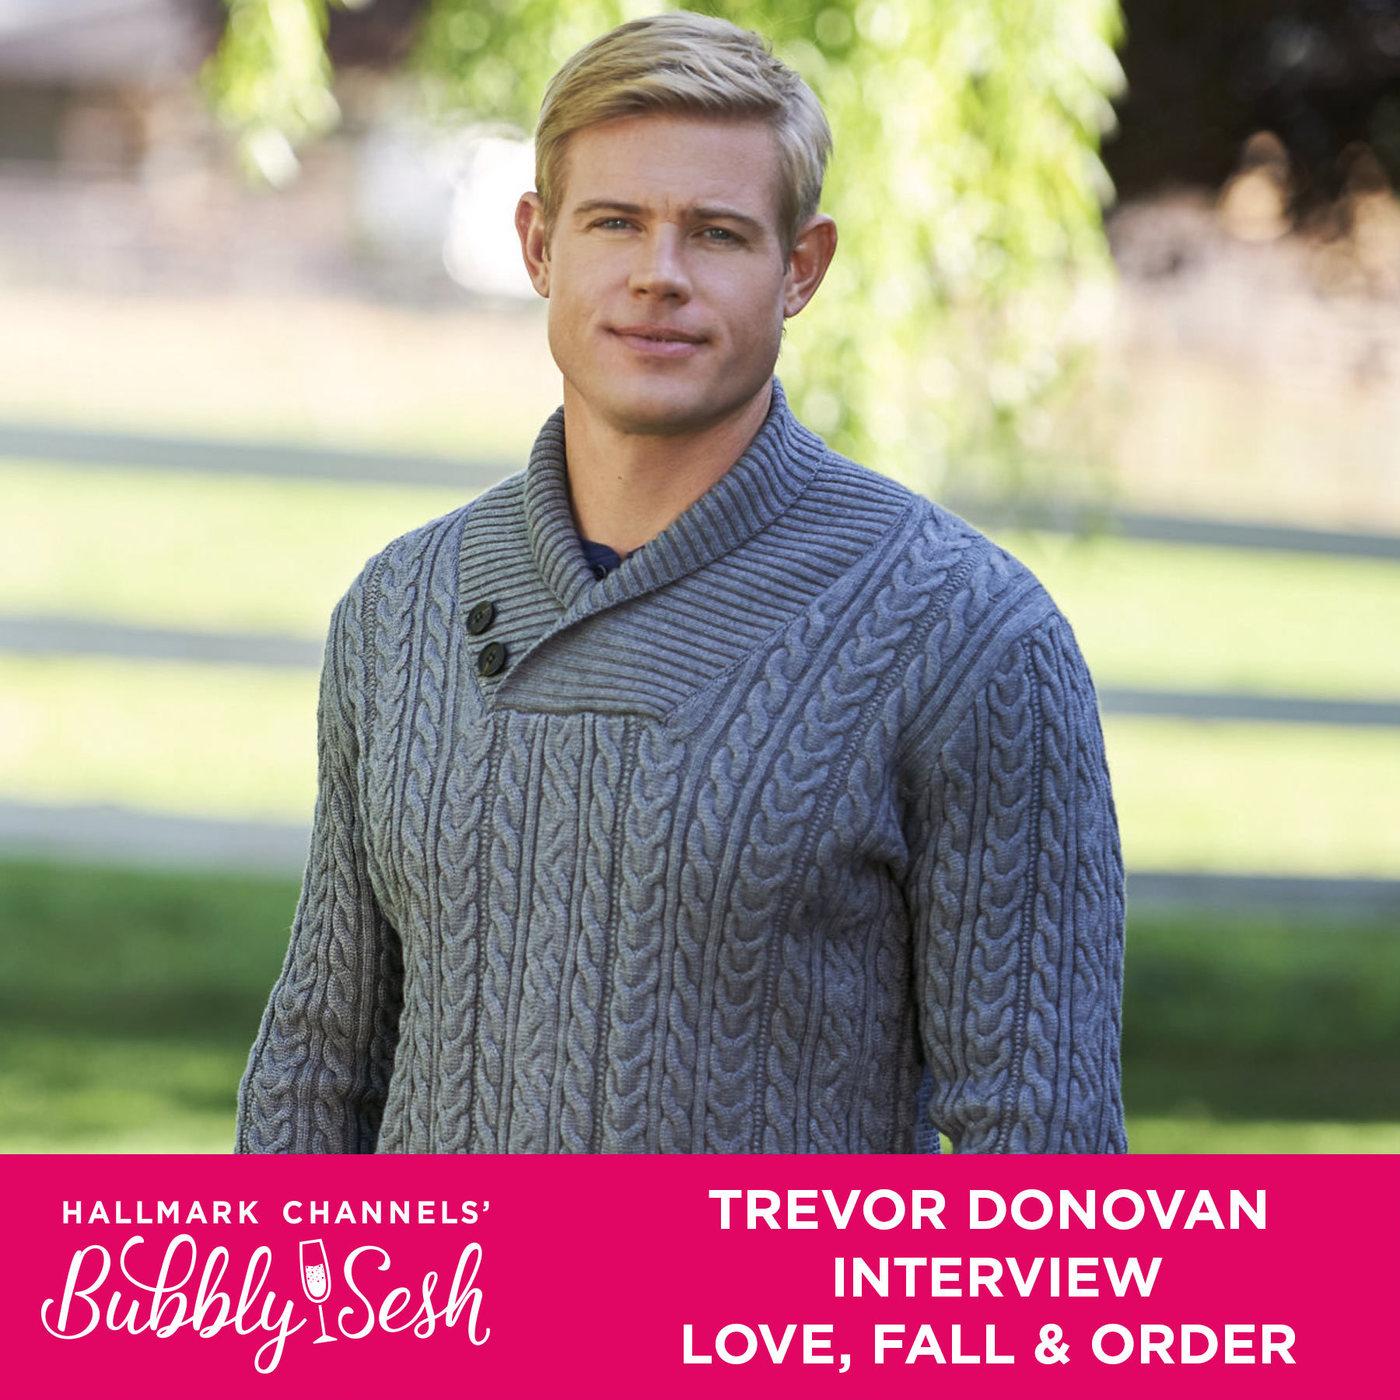 Trevor Donovan Interview - Love, Fall & Order